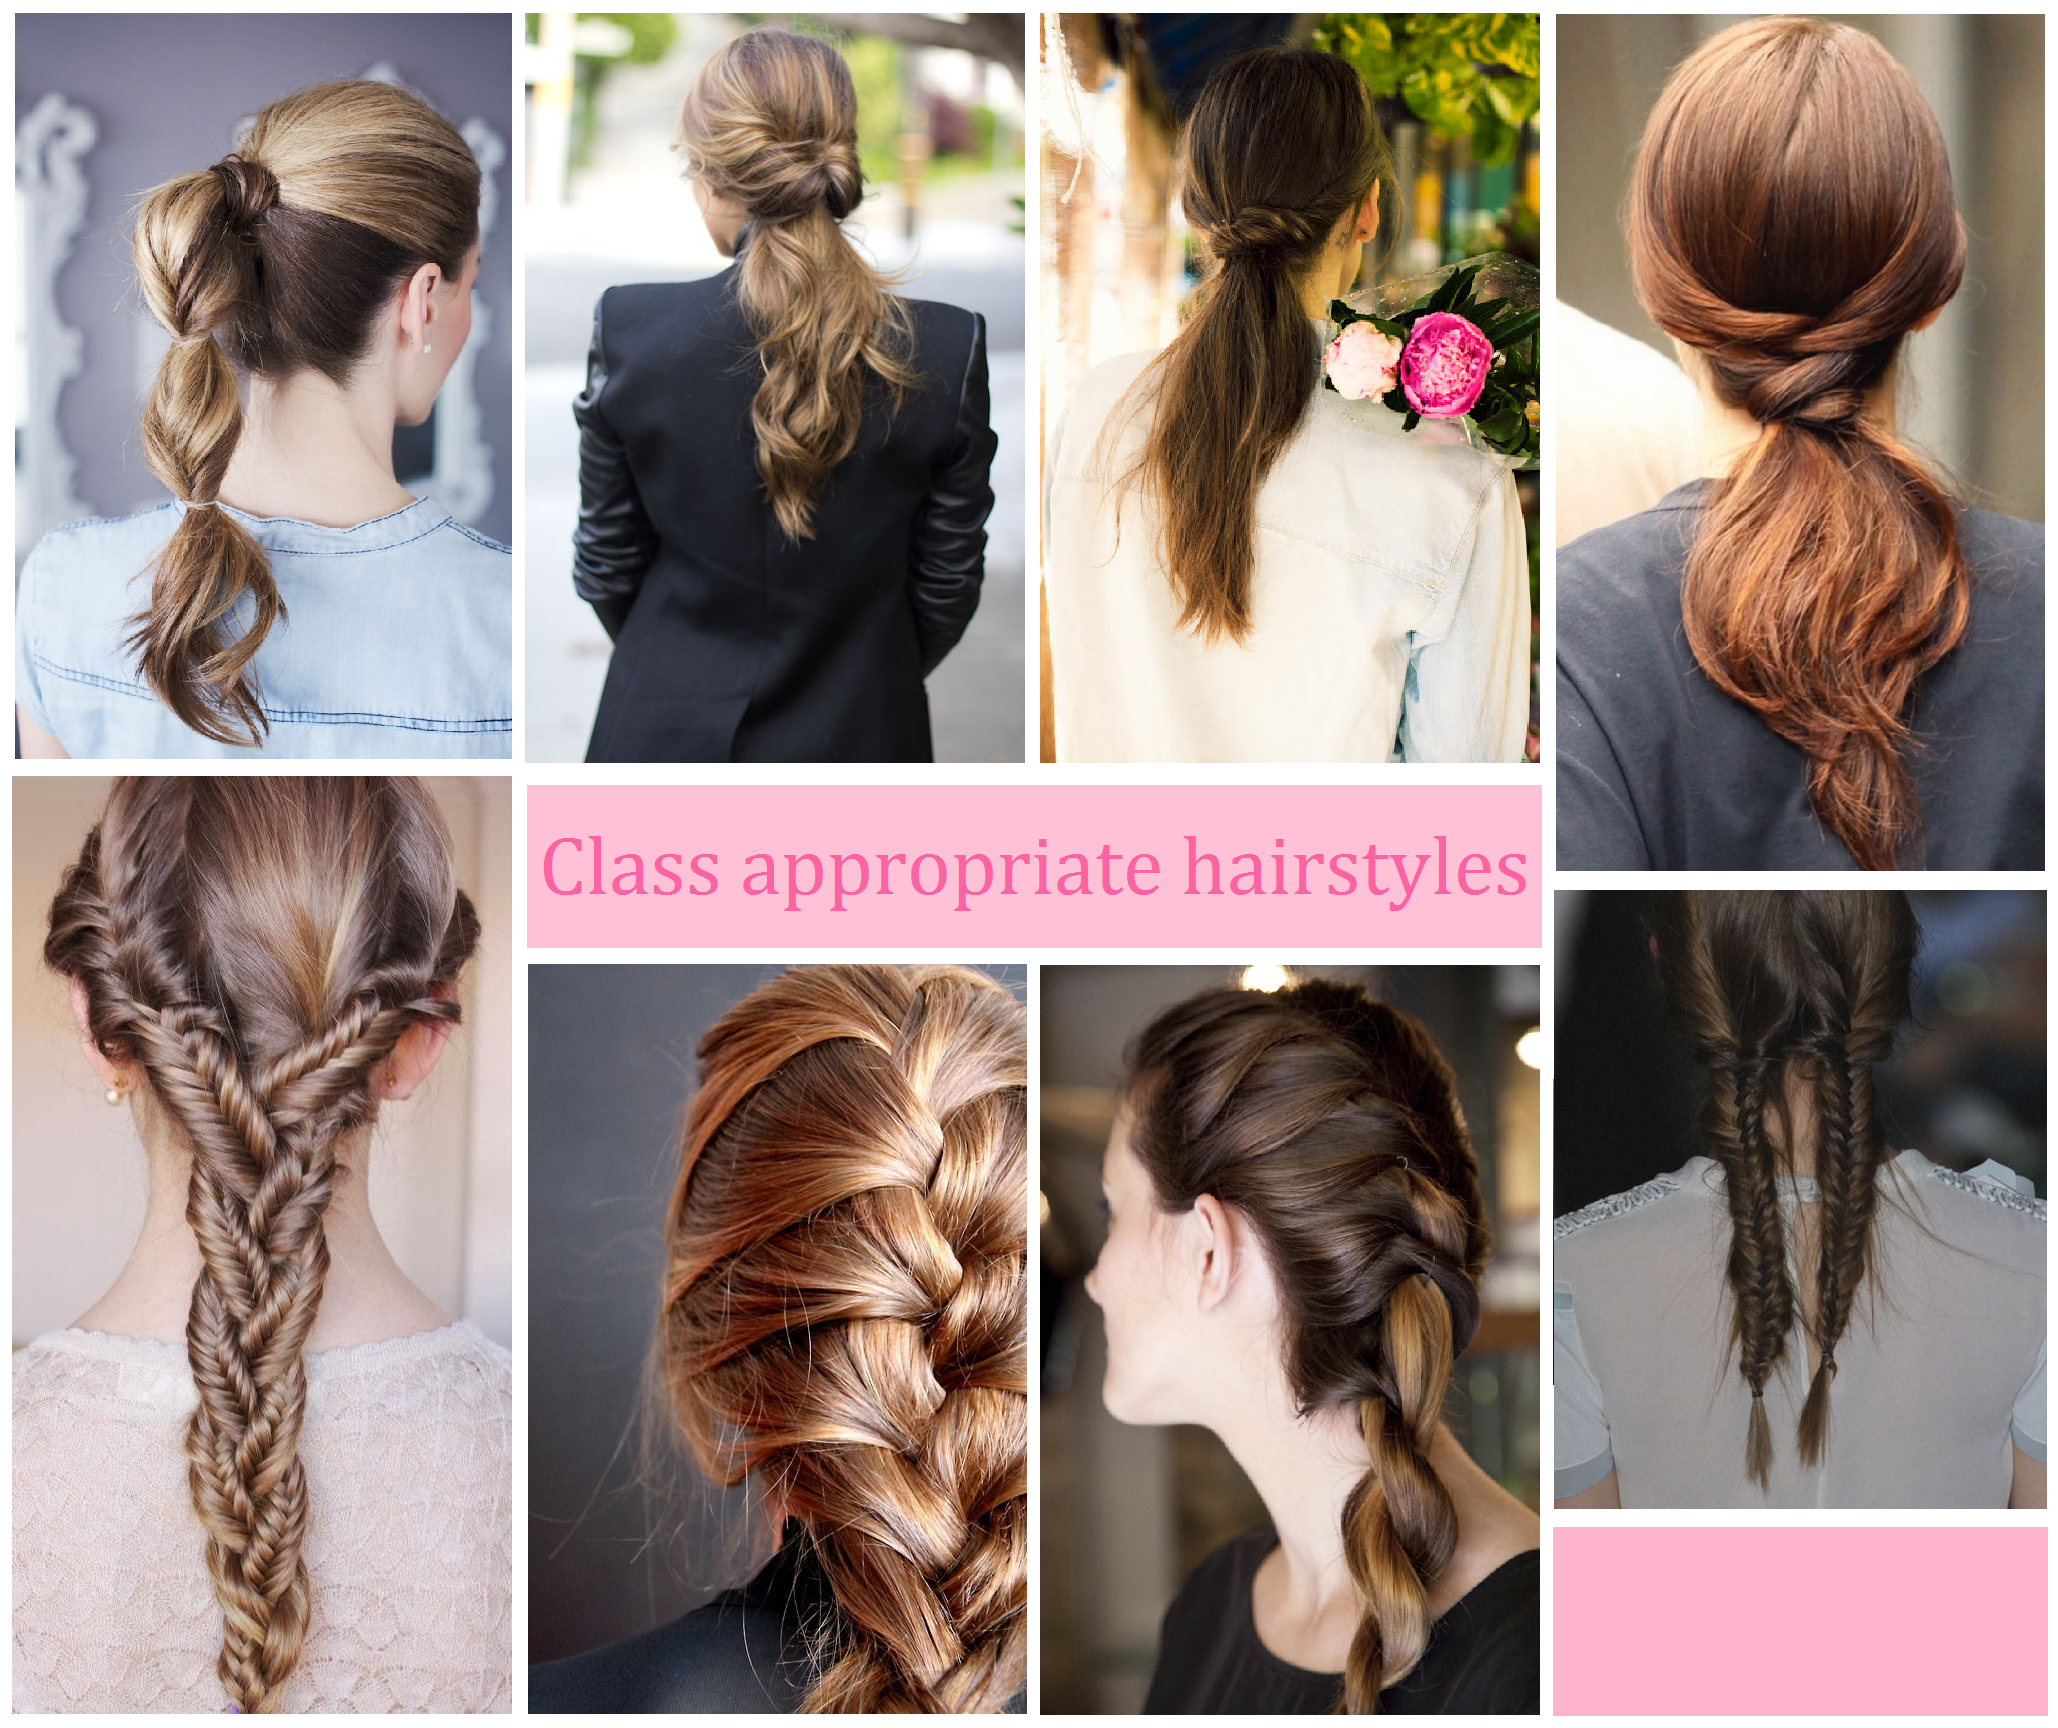 hair styles for school | hair styles | girls school